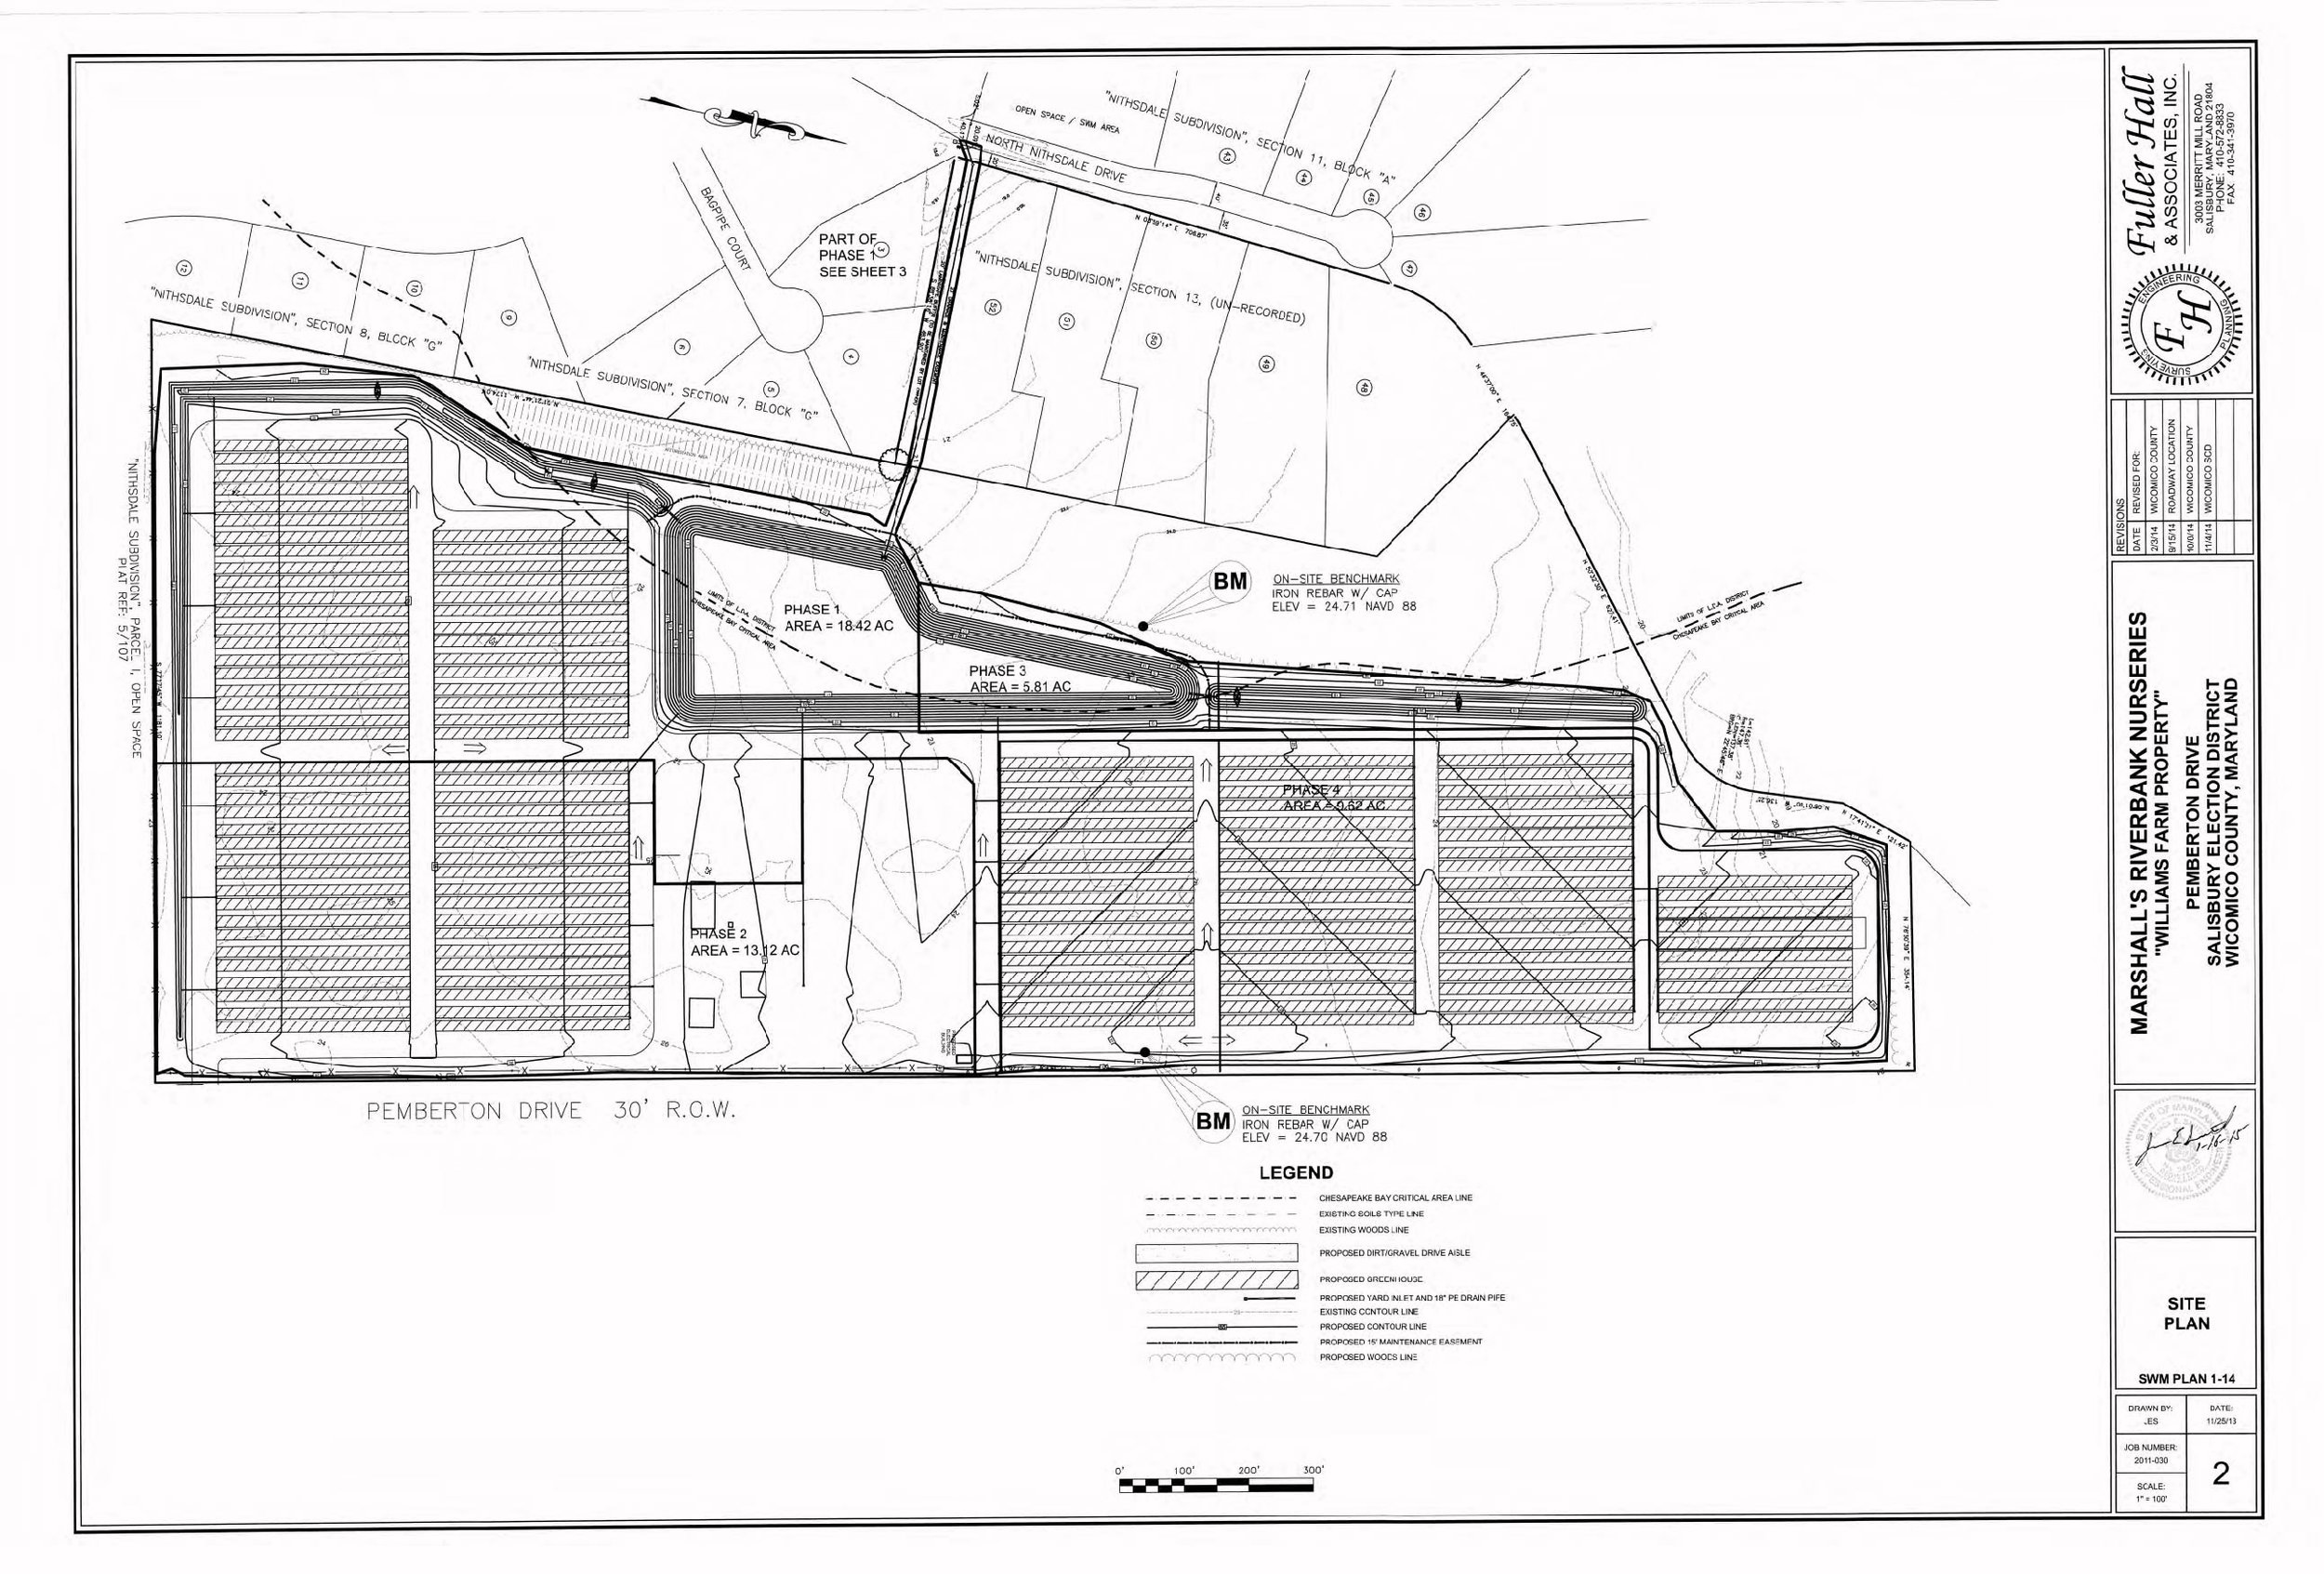 Marshall's riverbank nurseries - Wicomico County, Maryland